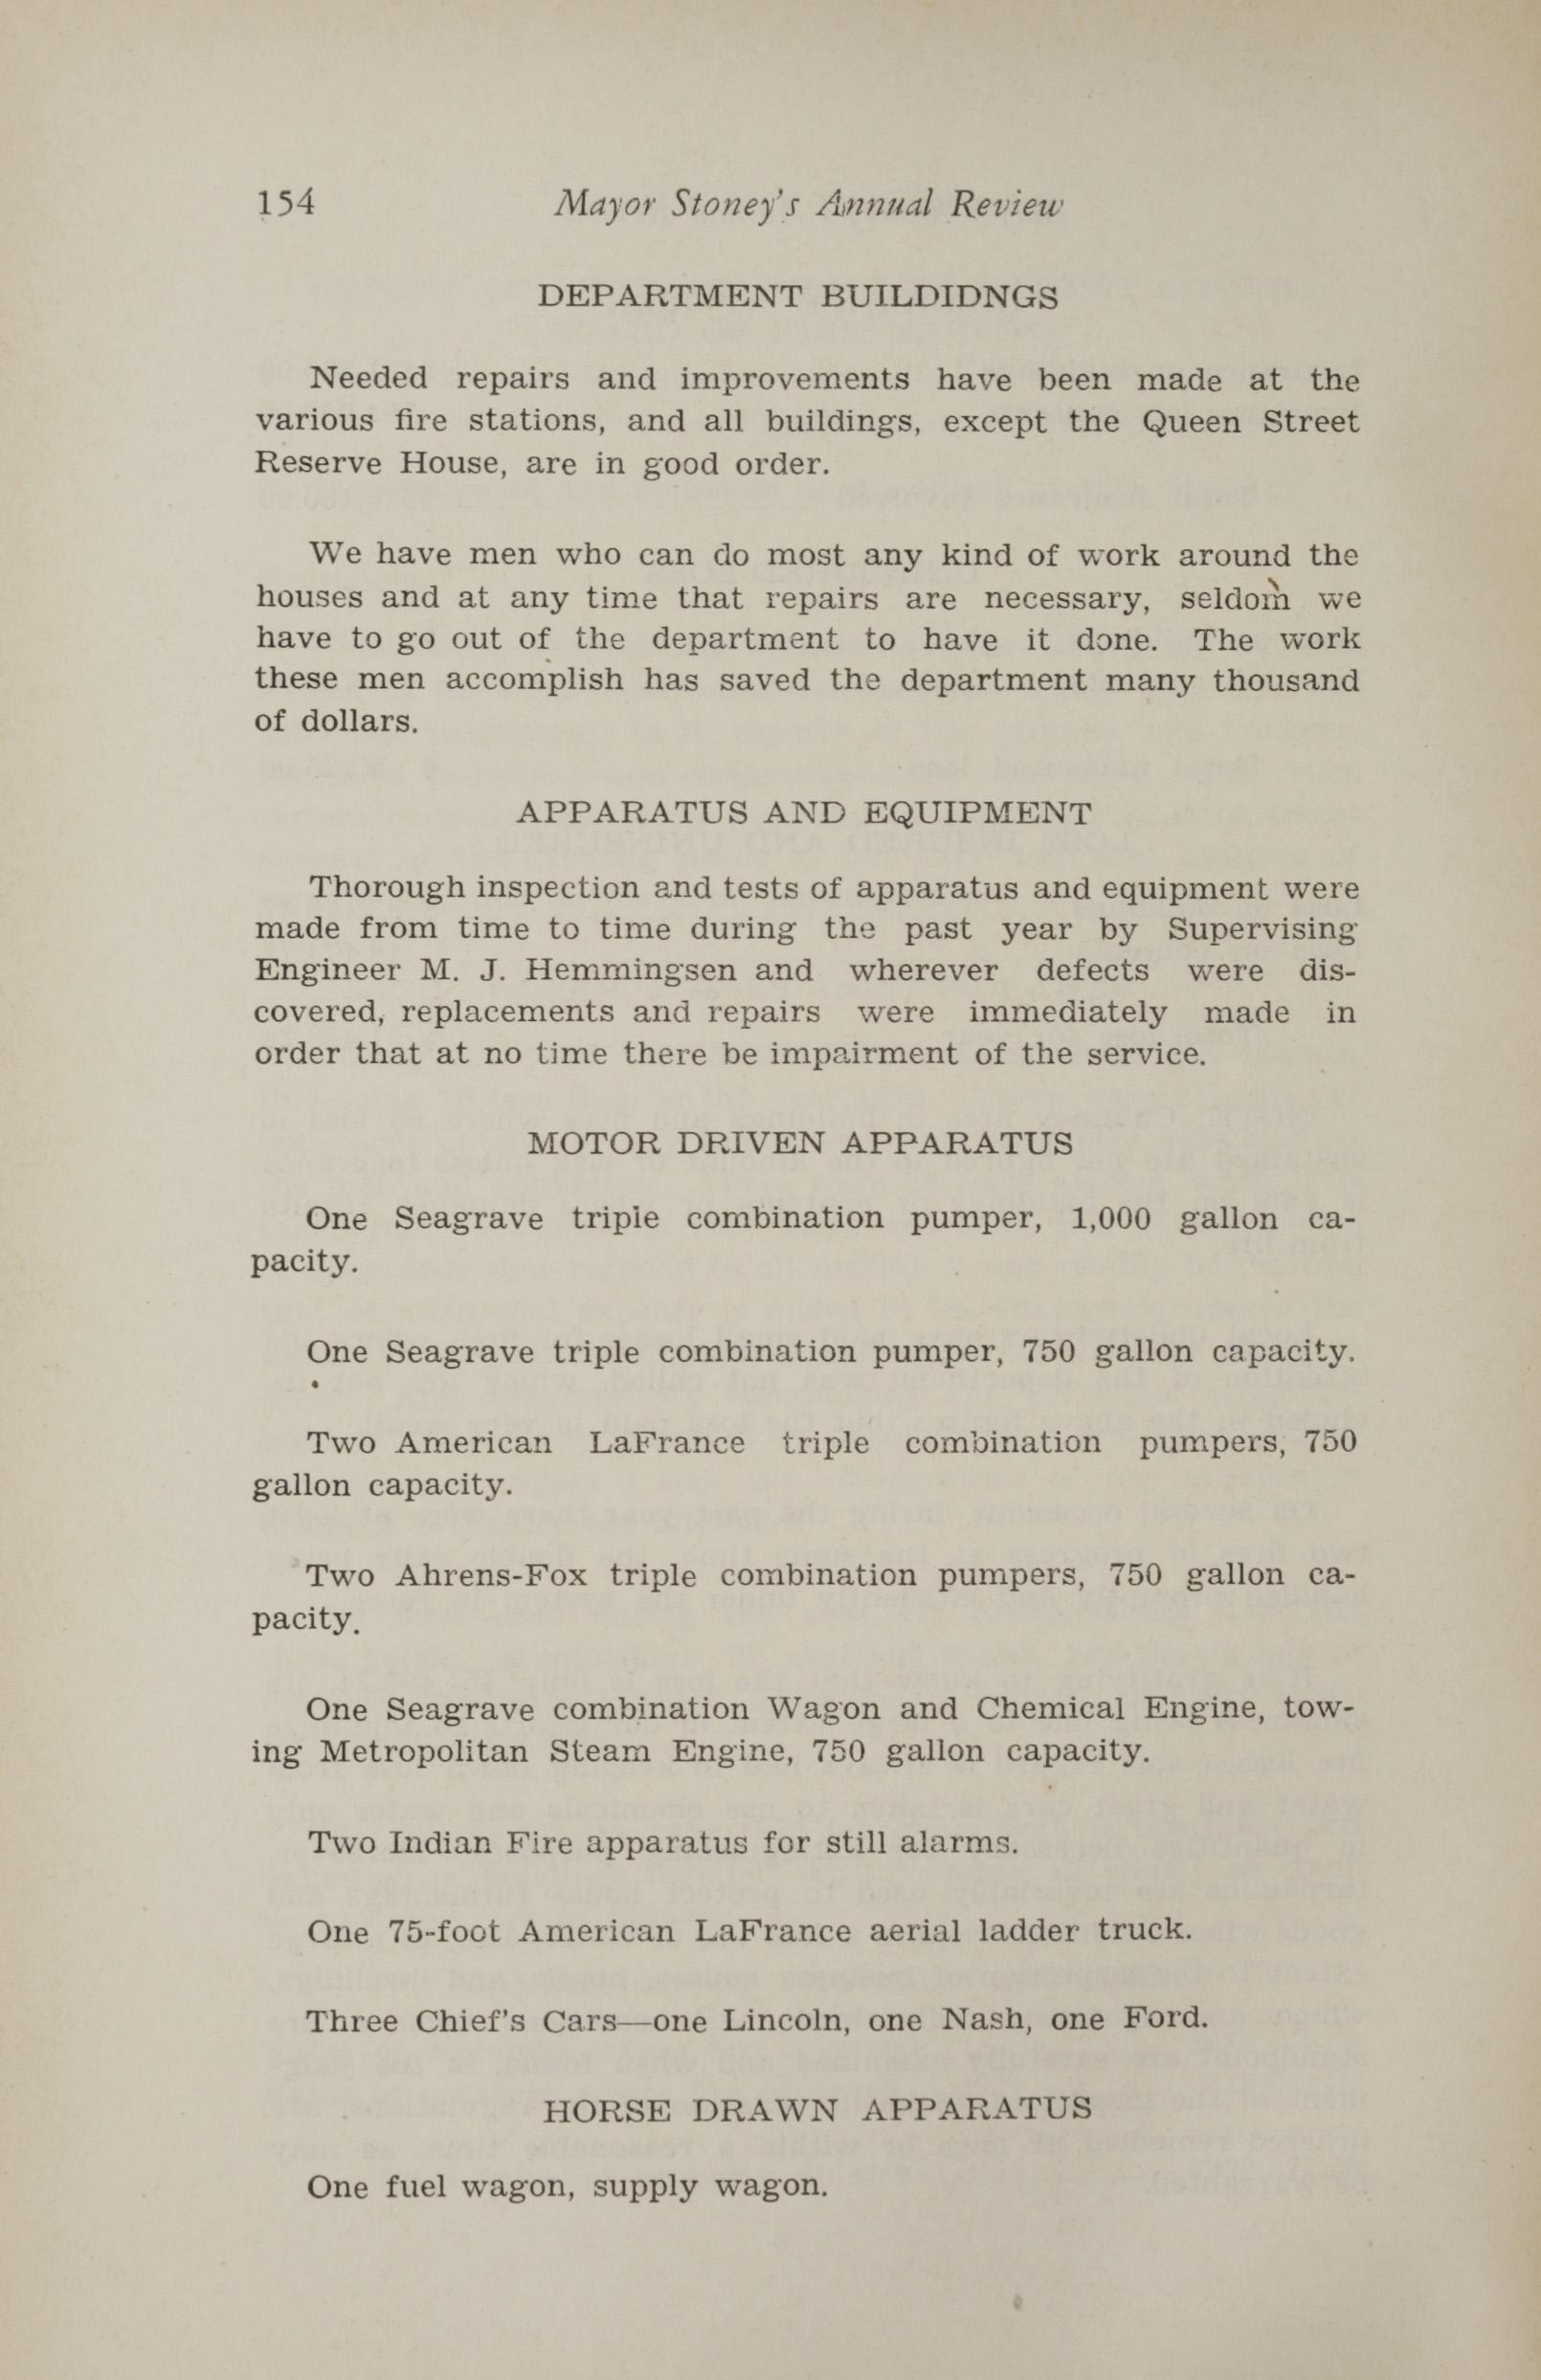 Charleston Yearbook, 1930, page 154